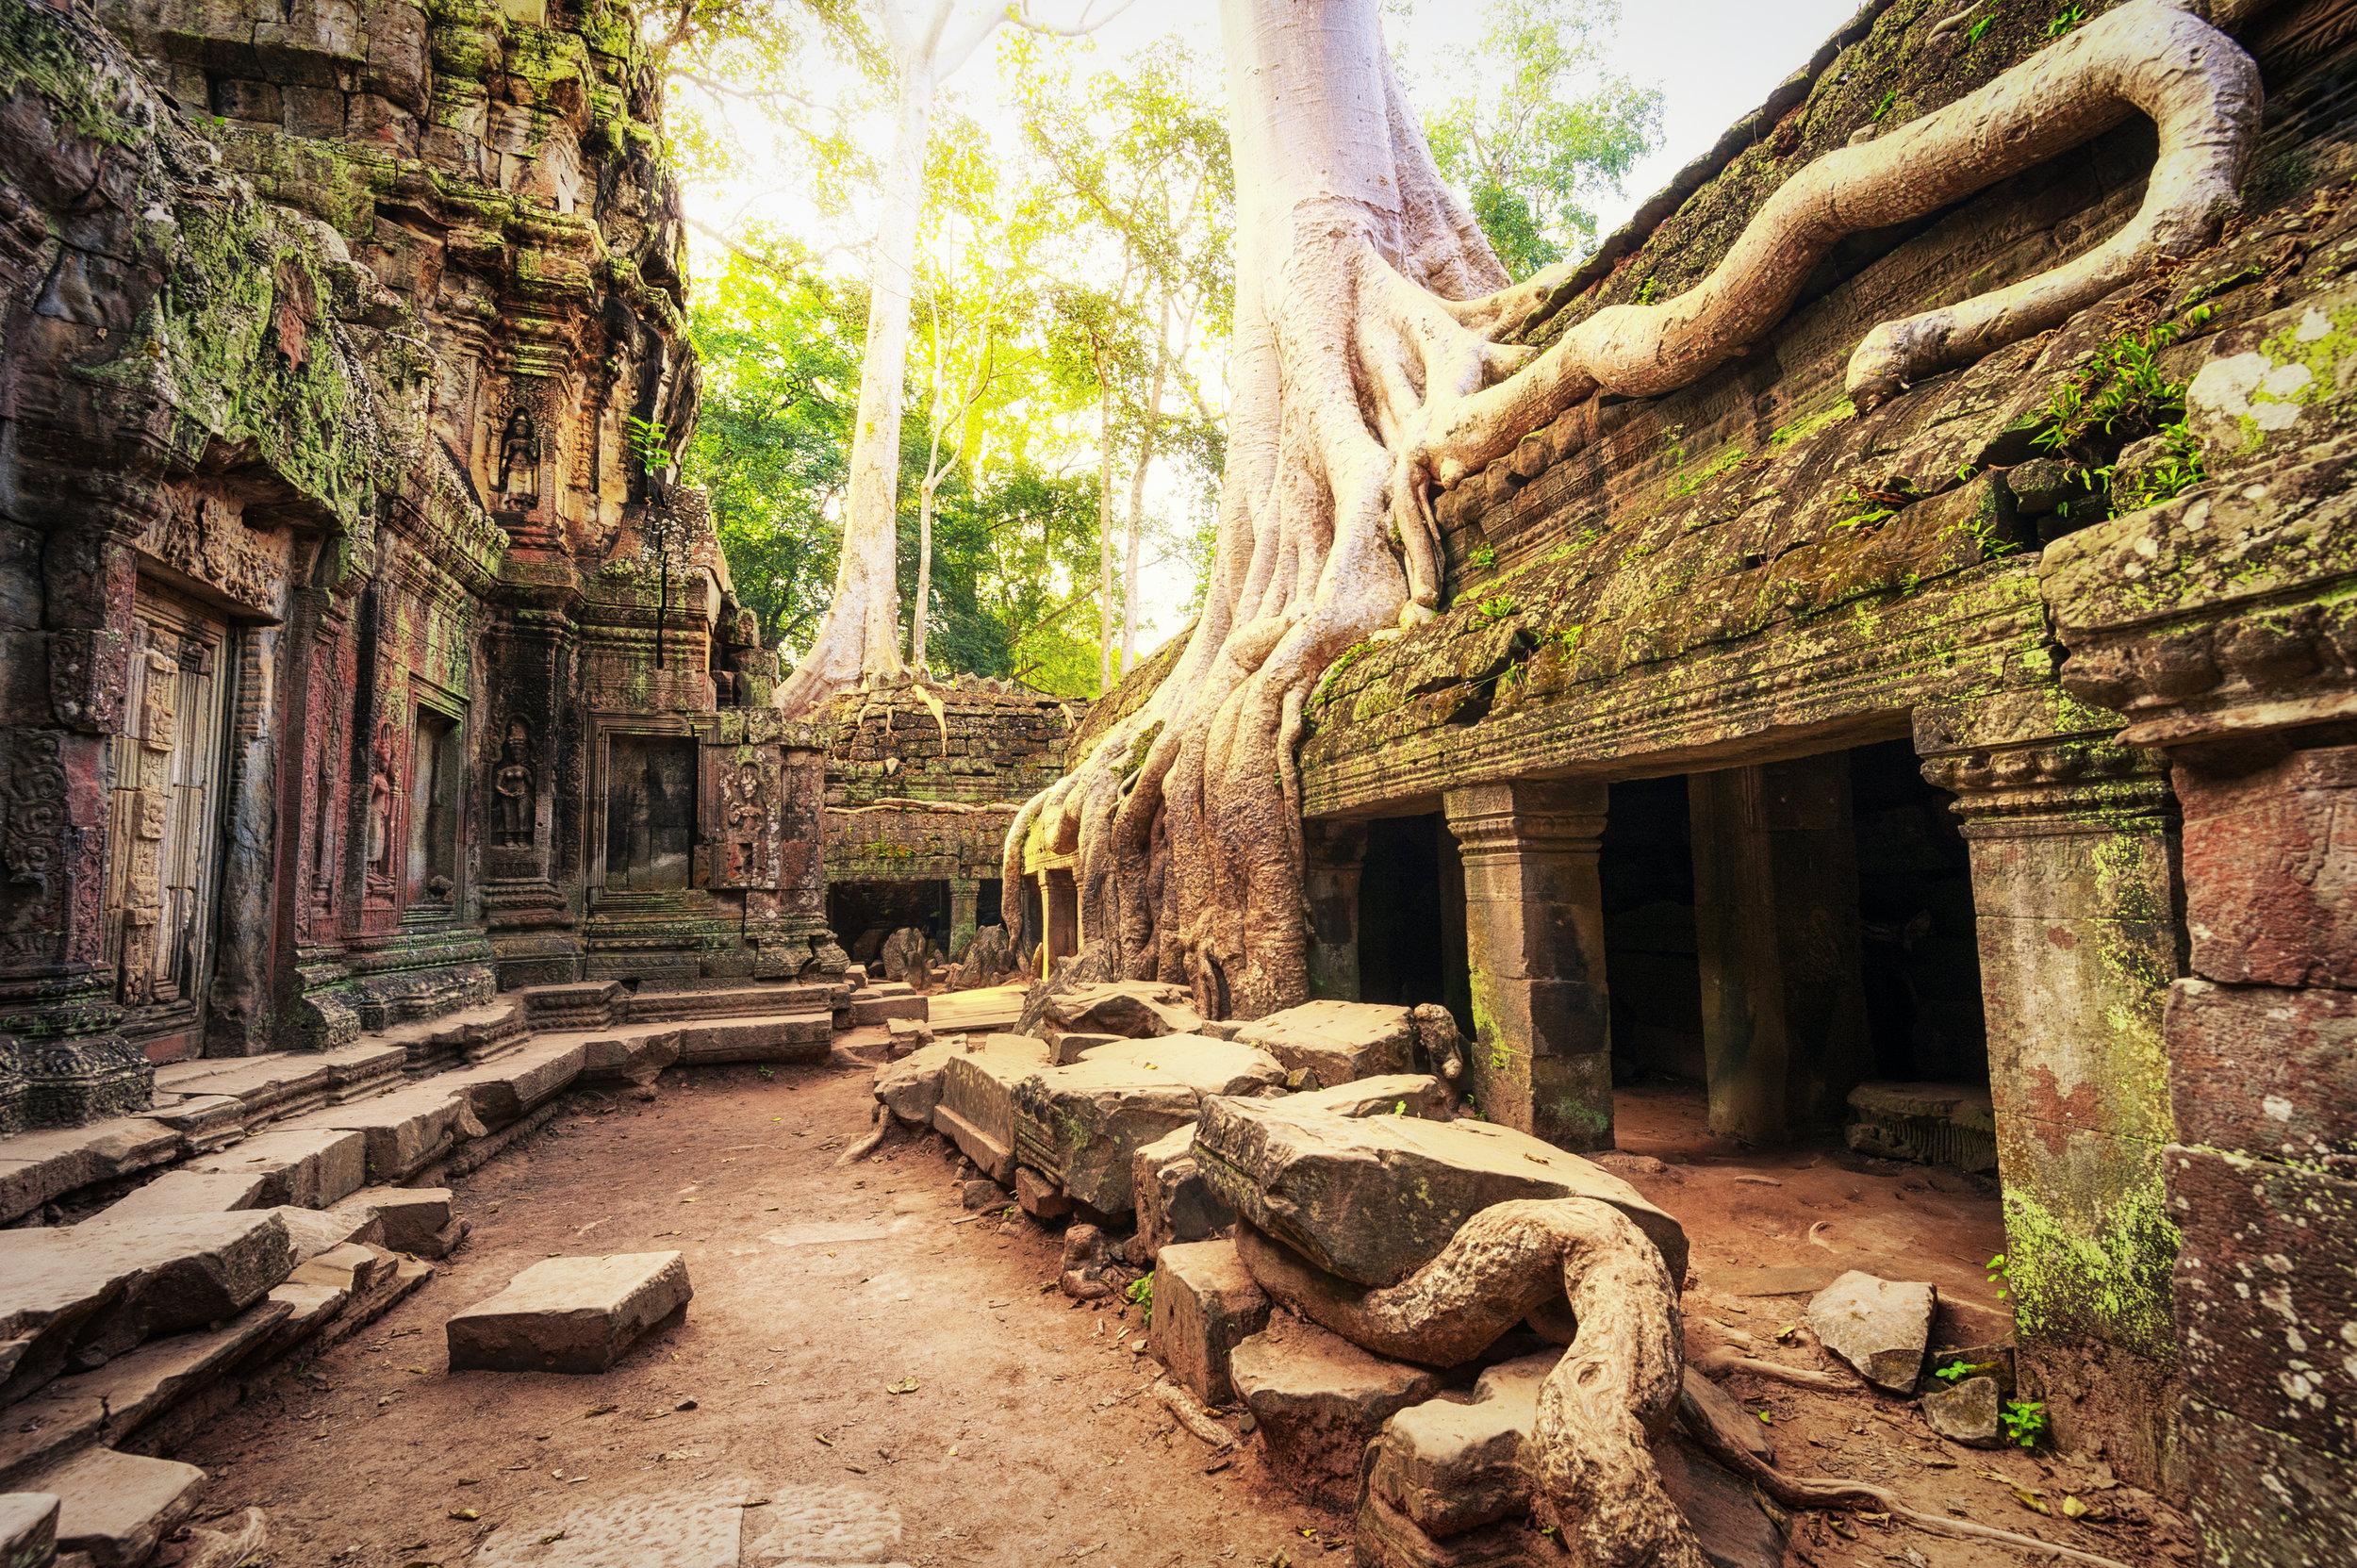 Angkor-Wat-Cambodia.-Ta-Prohm-Khmer-temple-498509111_3800x2528.jpeg